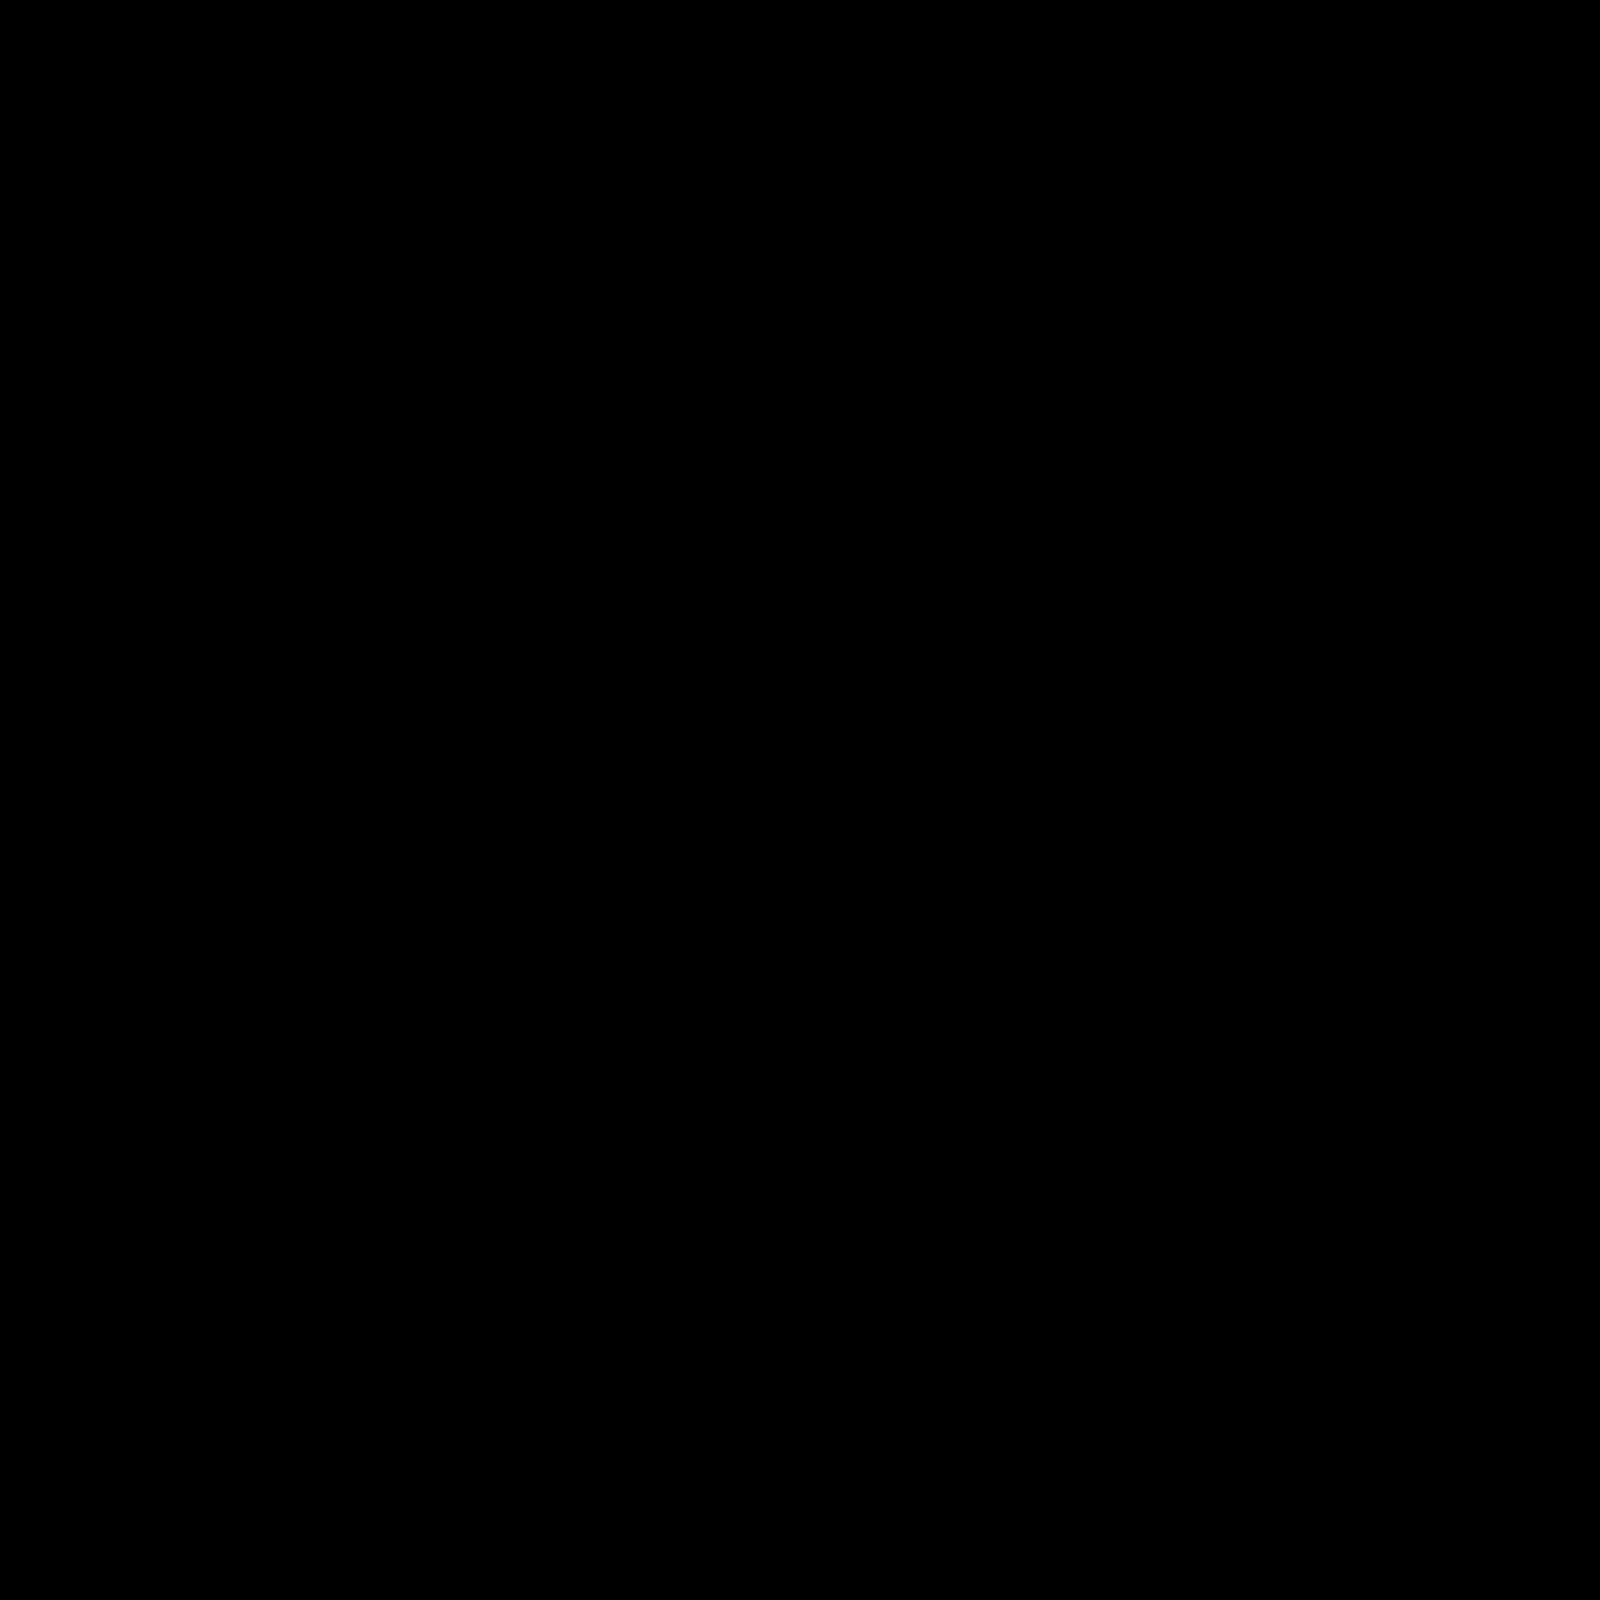 Hotel Star icon